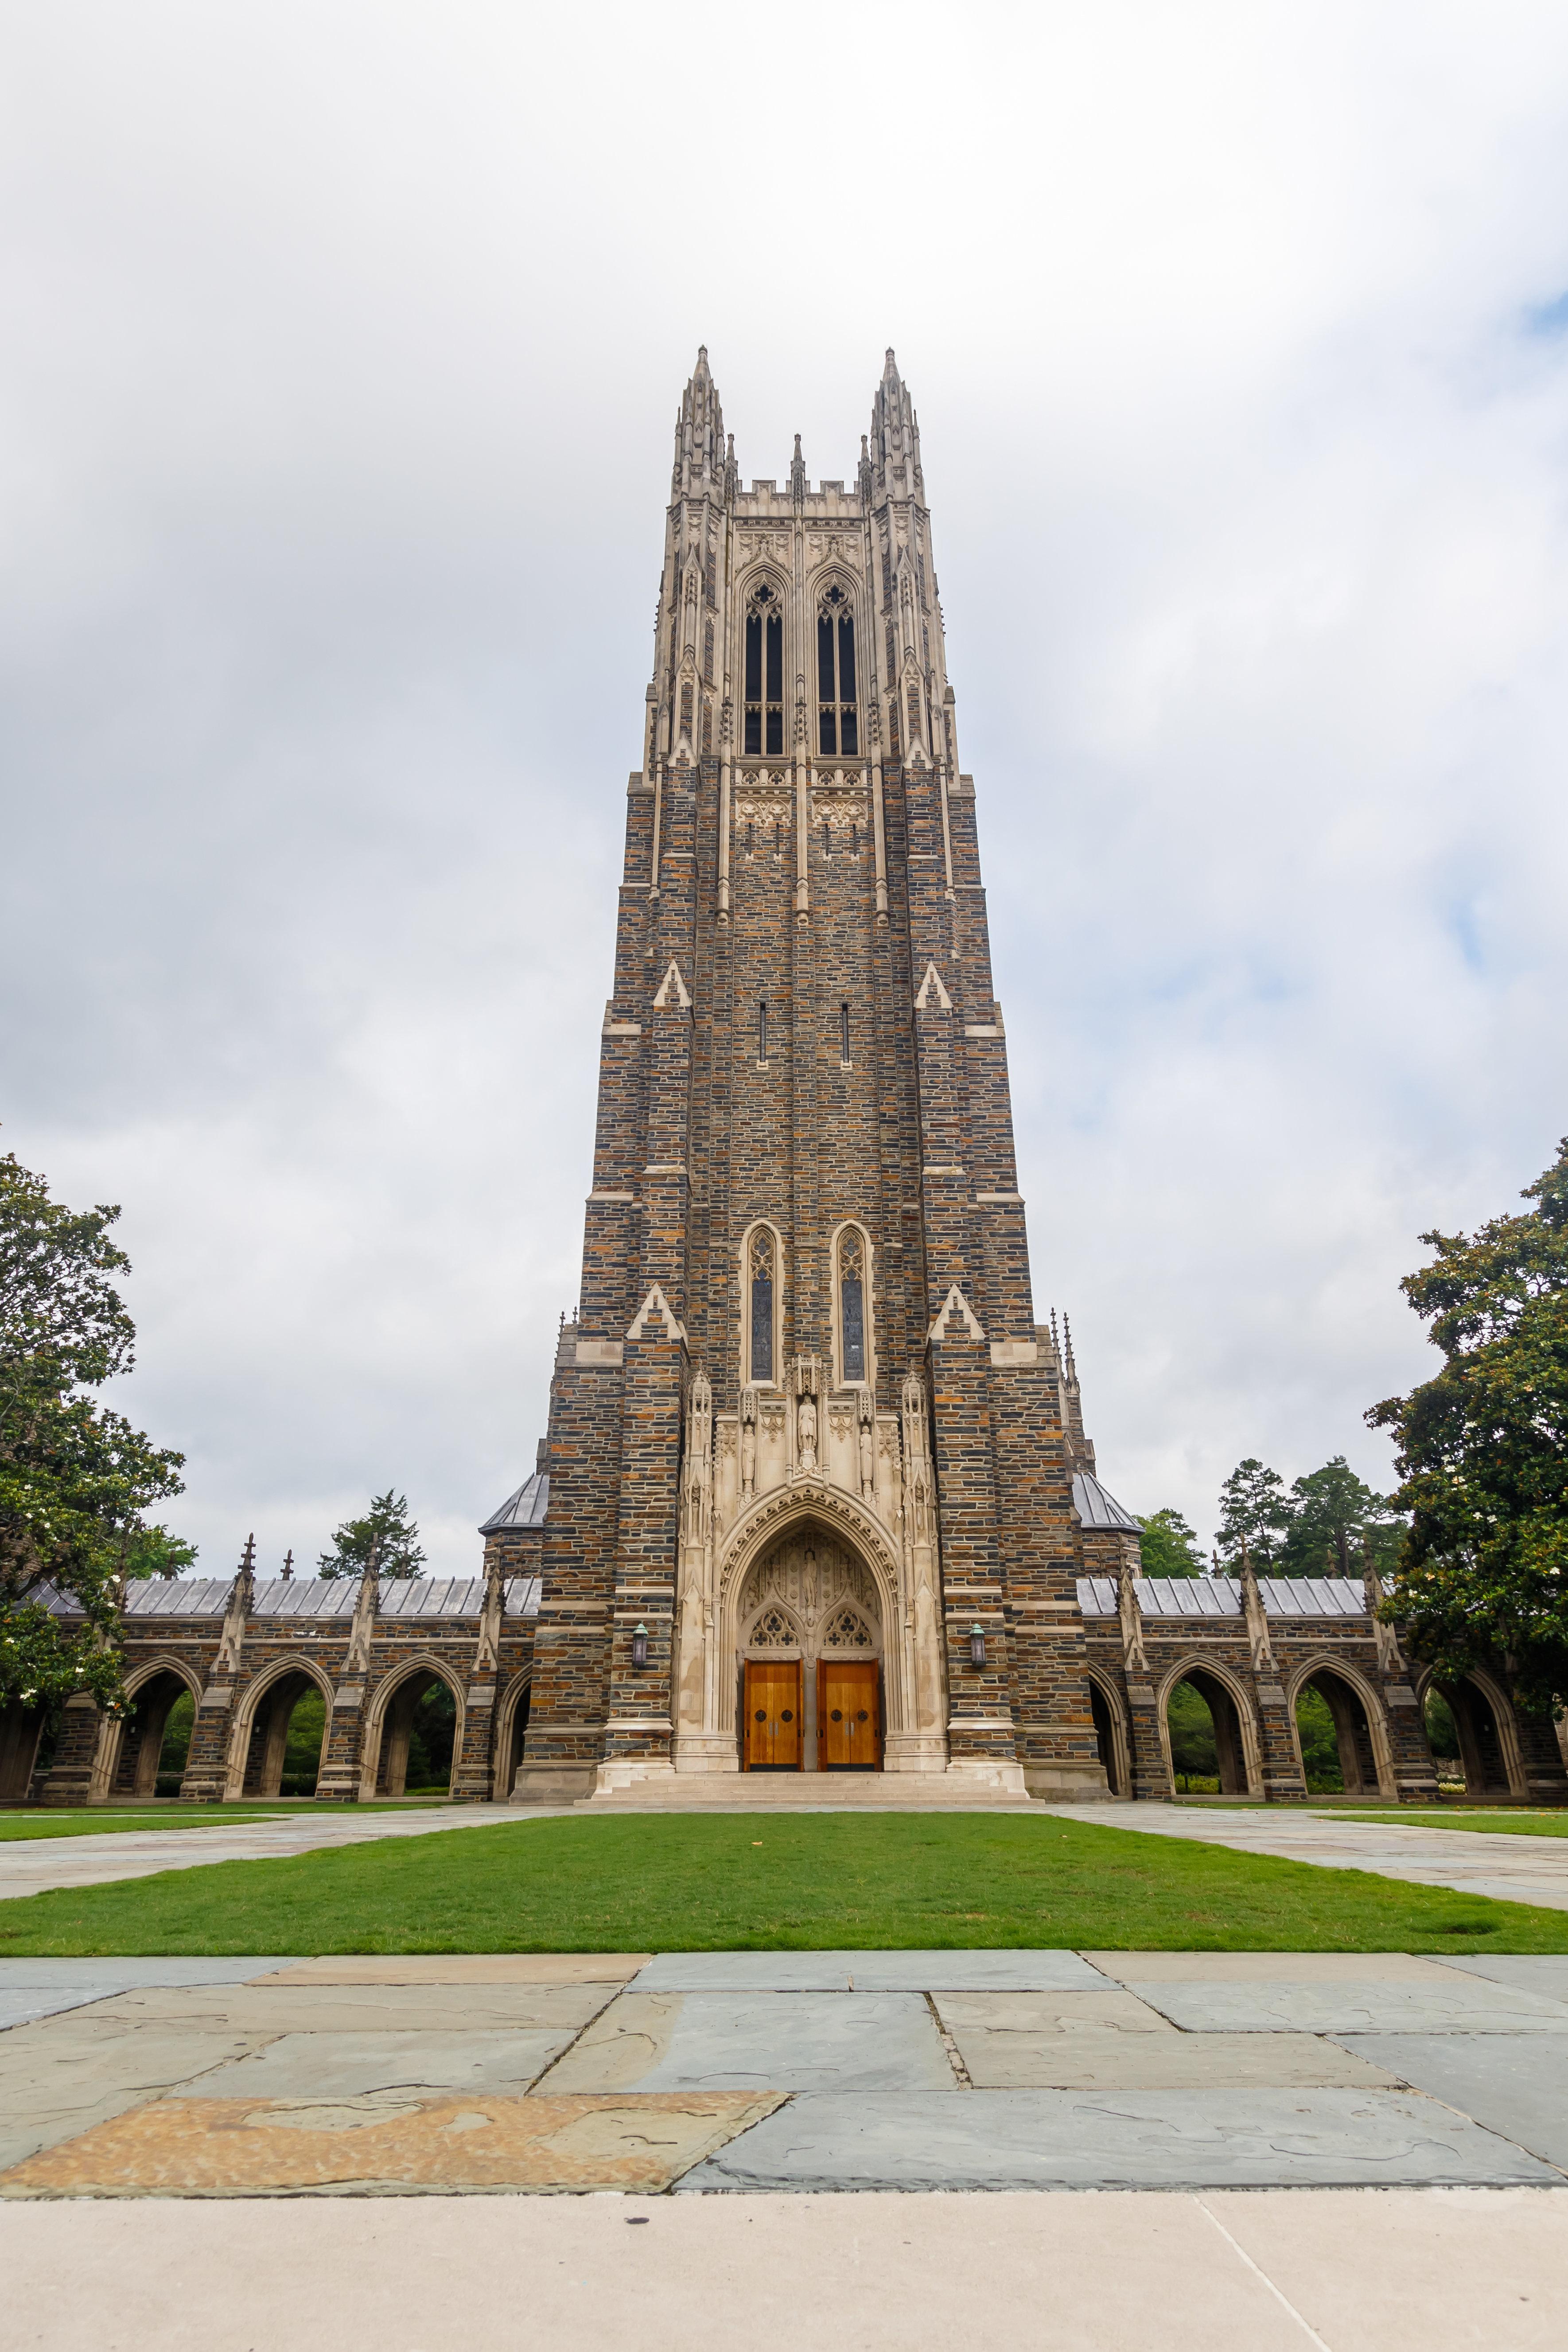 Duke Chapel on June, 18, 2017 at Duke University in Durham, North Carolina.